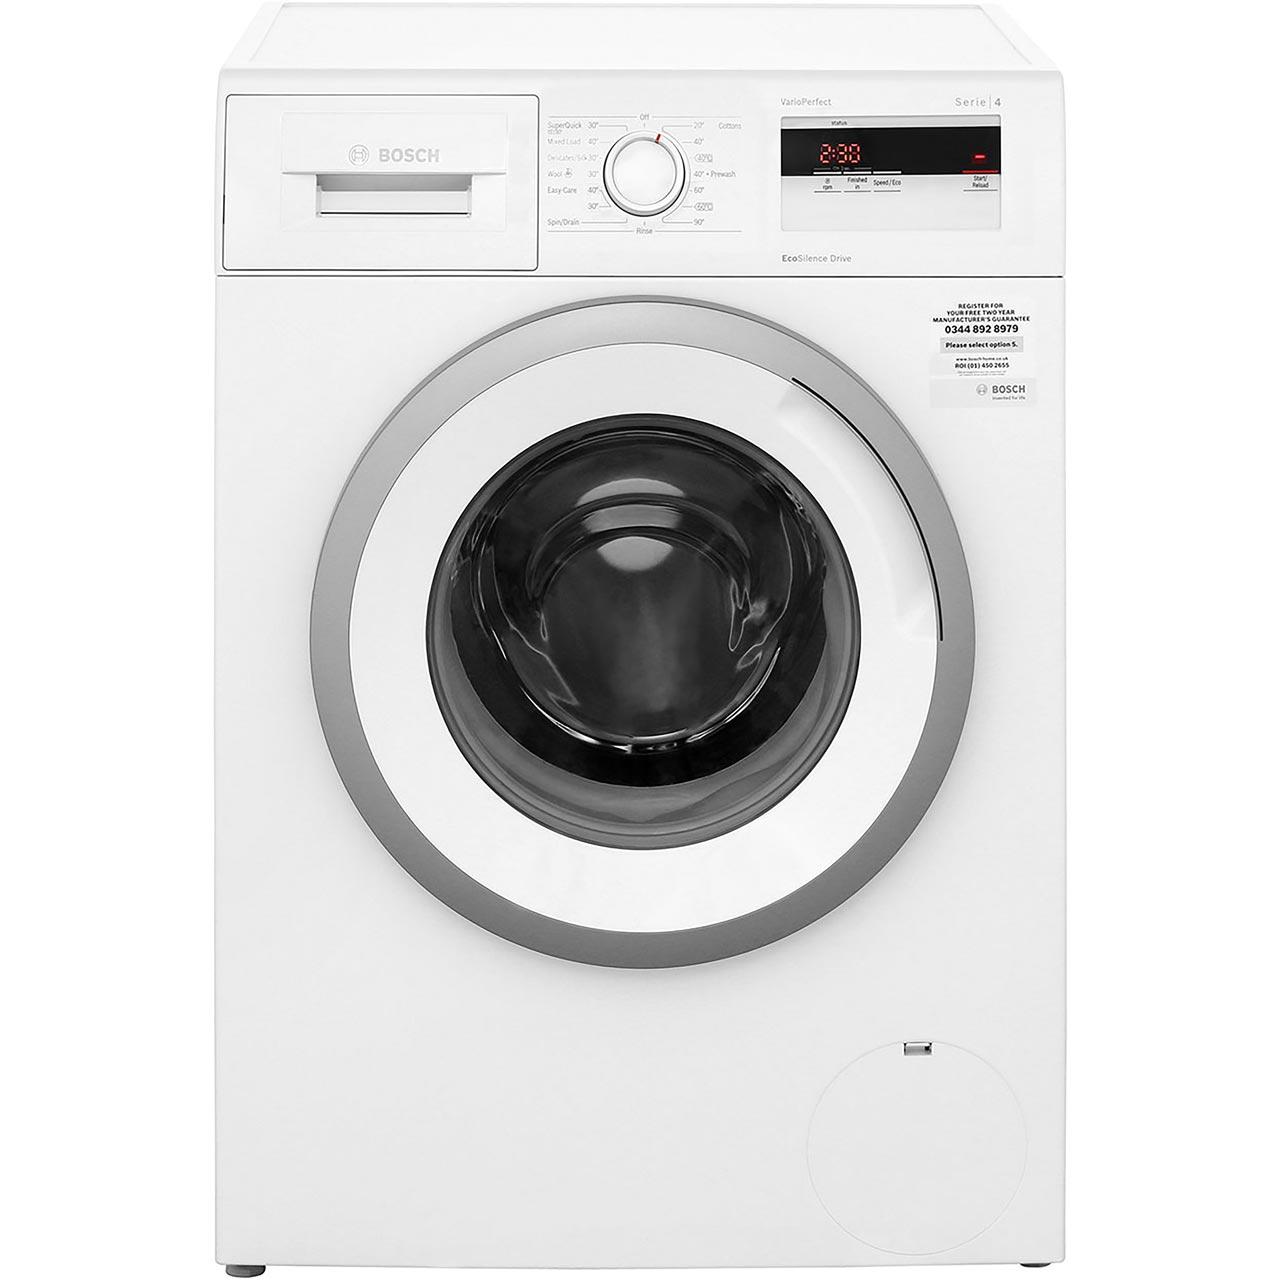 Admiralwashingmachinepartsdiagram Washing Machine Admiral Washing